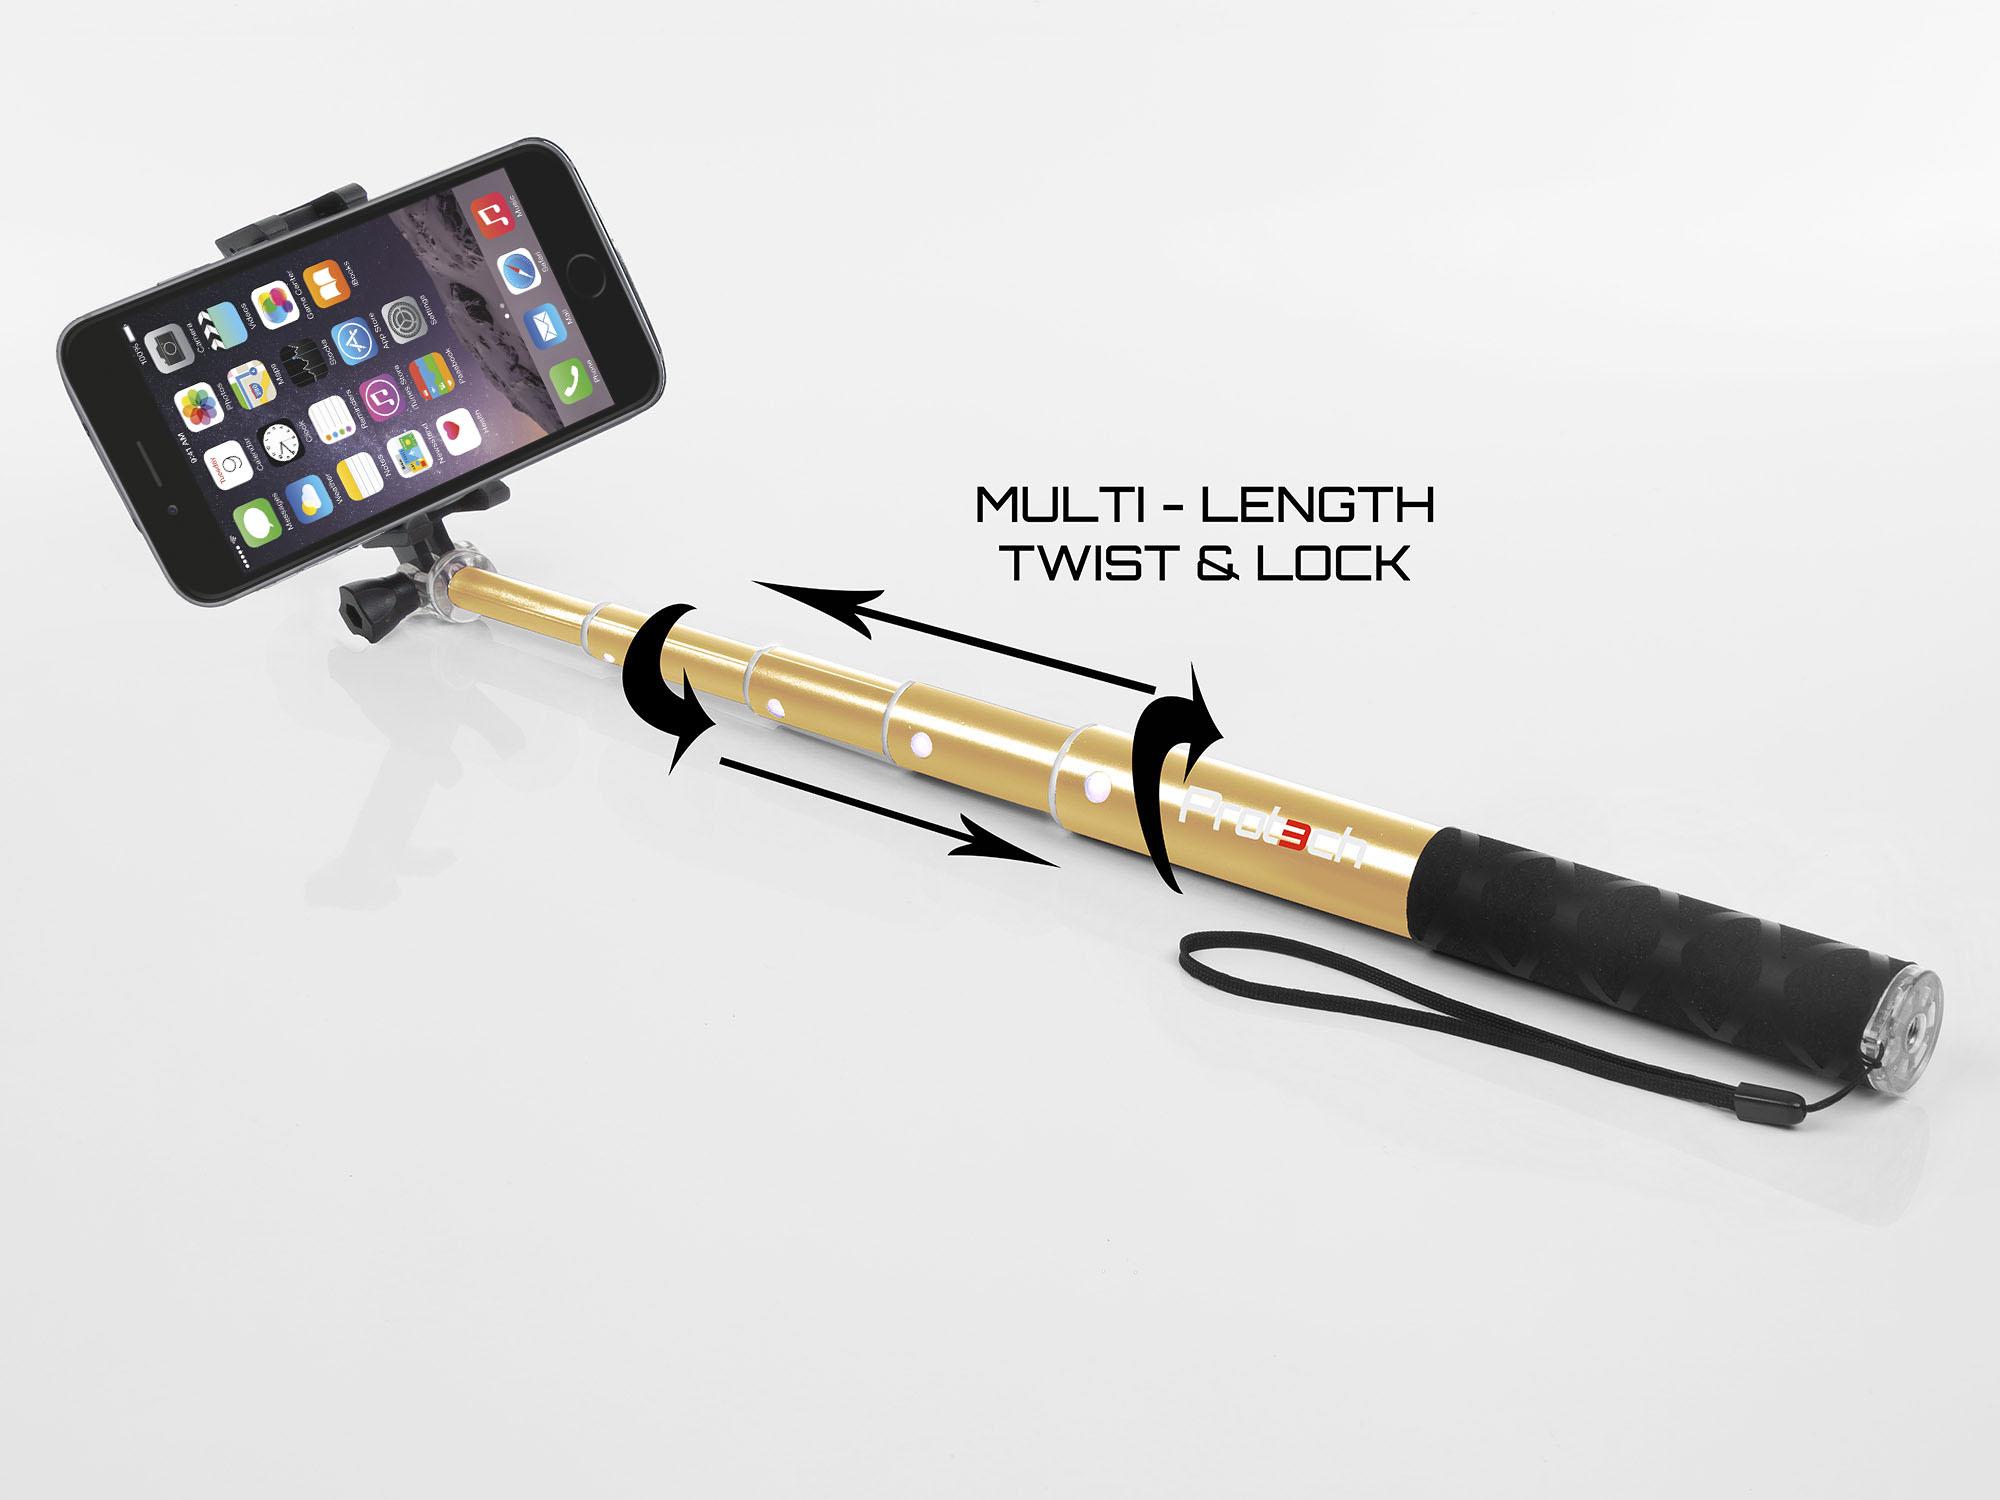 apple iphone monopod selfie stick 60cm telescopic compact bluetooth tripod. Black Bedroom Furniture Sets. Home Design Ideas